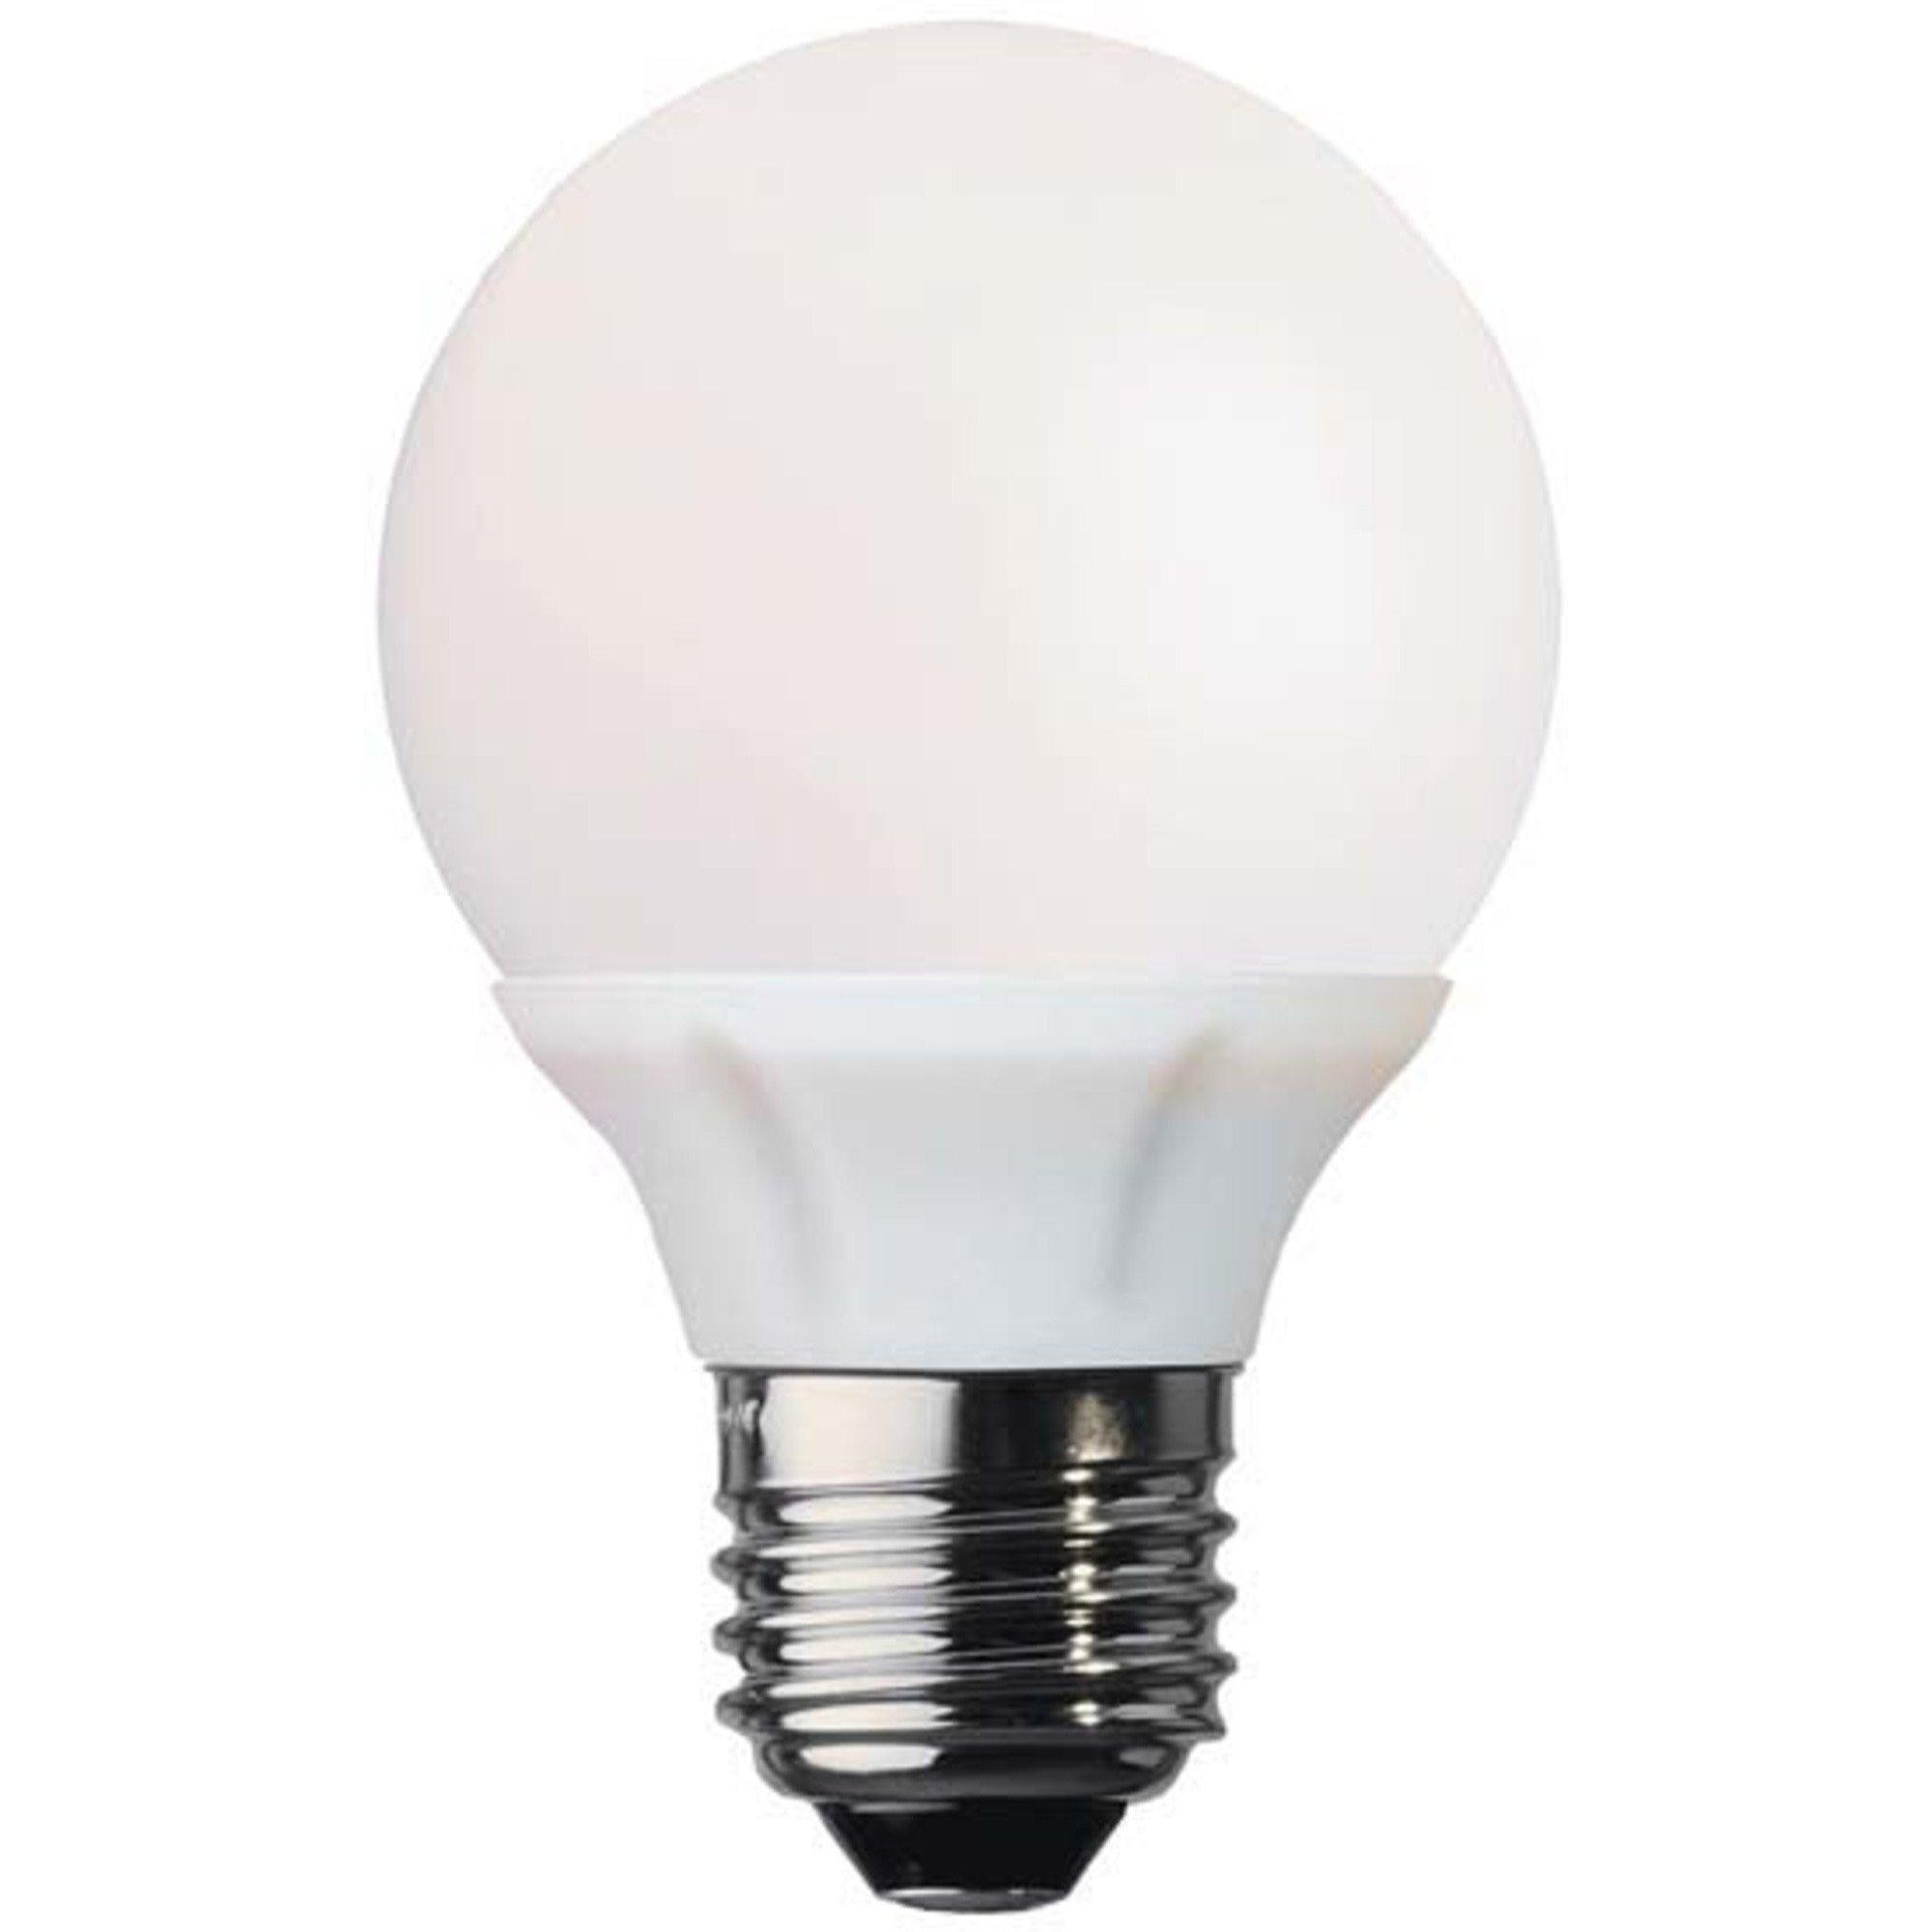 Globen Lighting Ljuskälla LED 358-28 Normal Opal